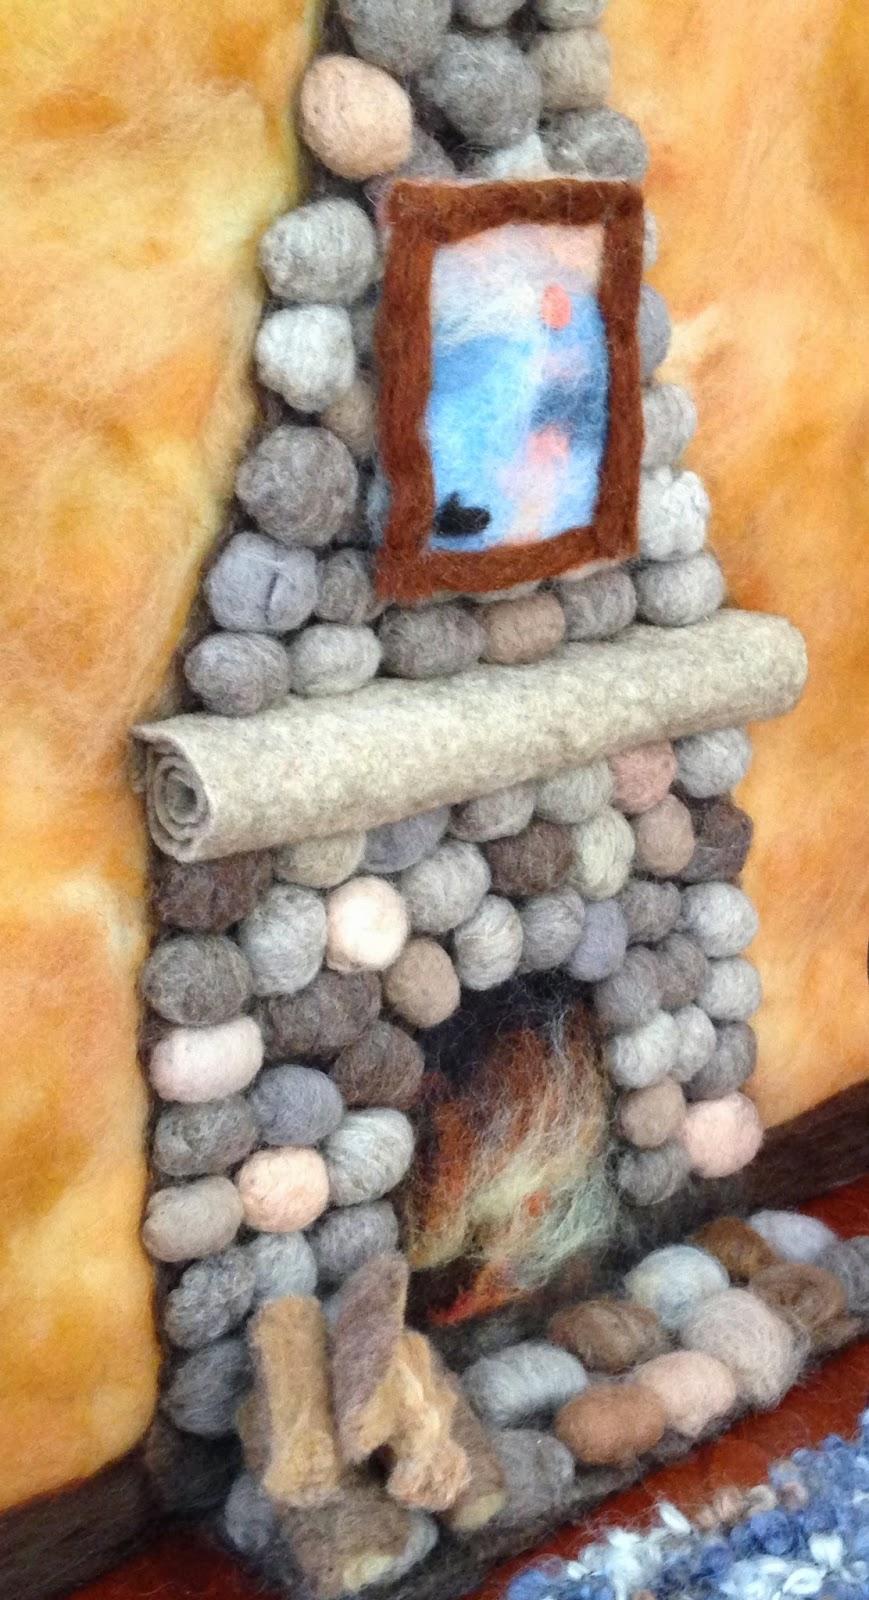 claudia marie felt how to create a wool fireplace for fireplace for wall fireplace for wall